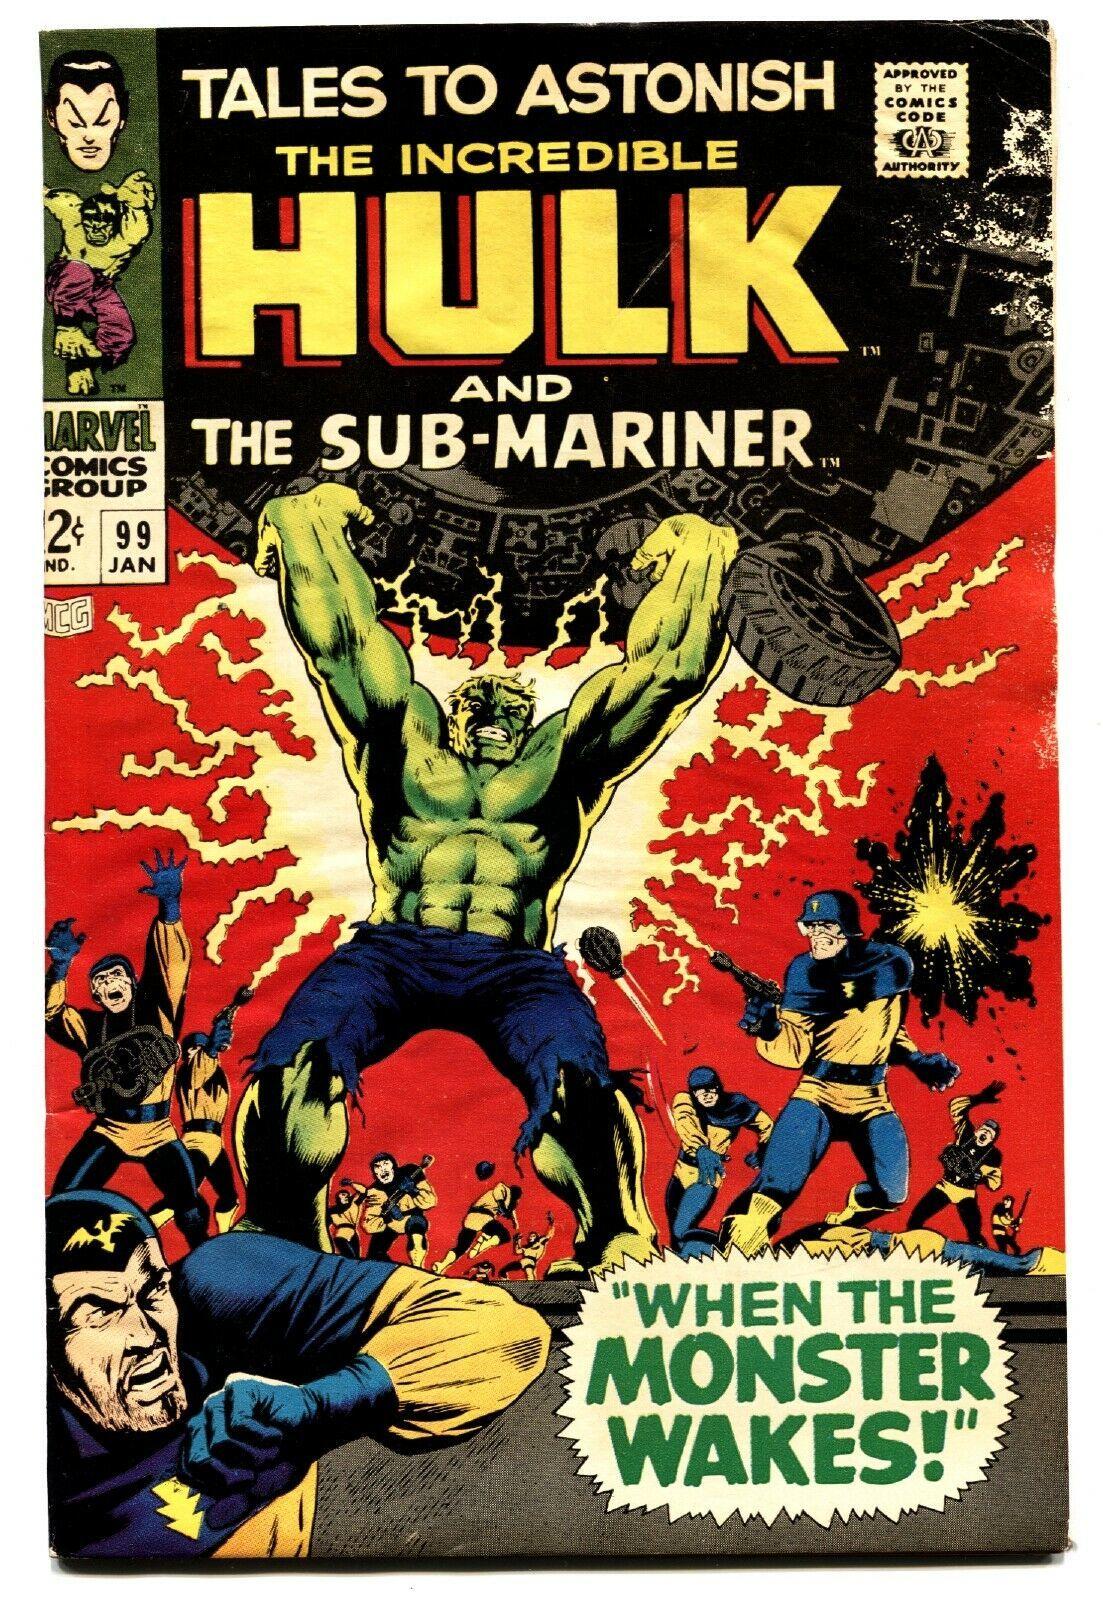 TALES TO ASTONISH #99 COMIC BOOK -HULK/SUB-MARINER-1967 G/VG - $16.39